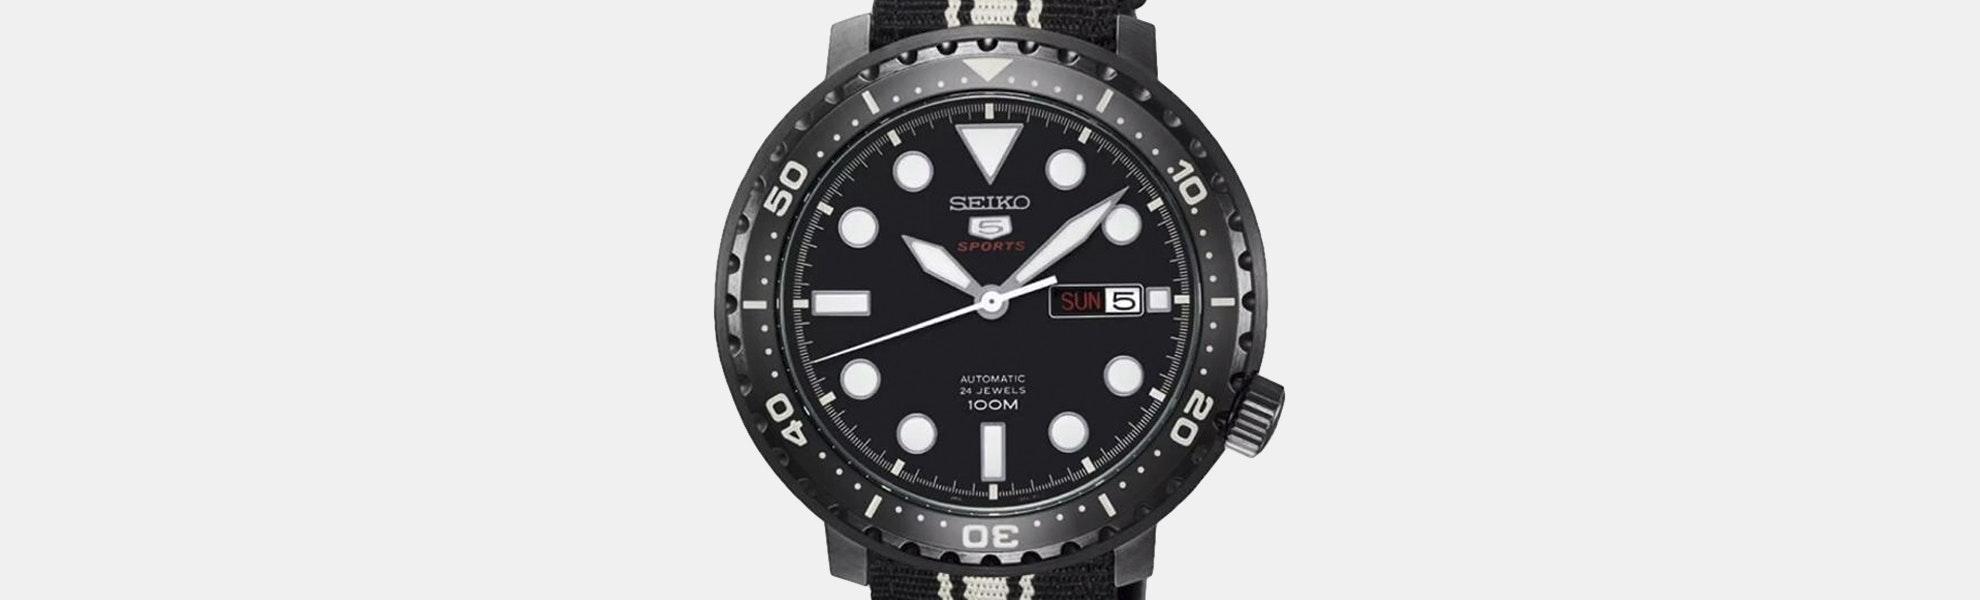 Seiko SRPC6X Automatic Watch